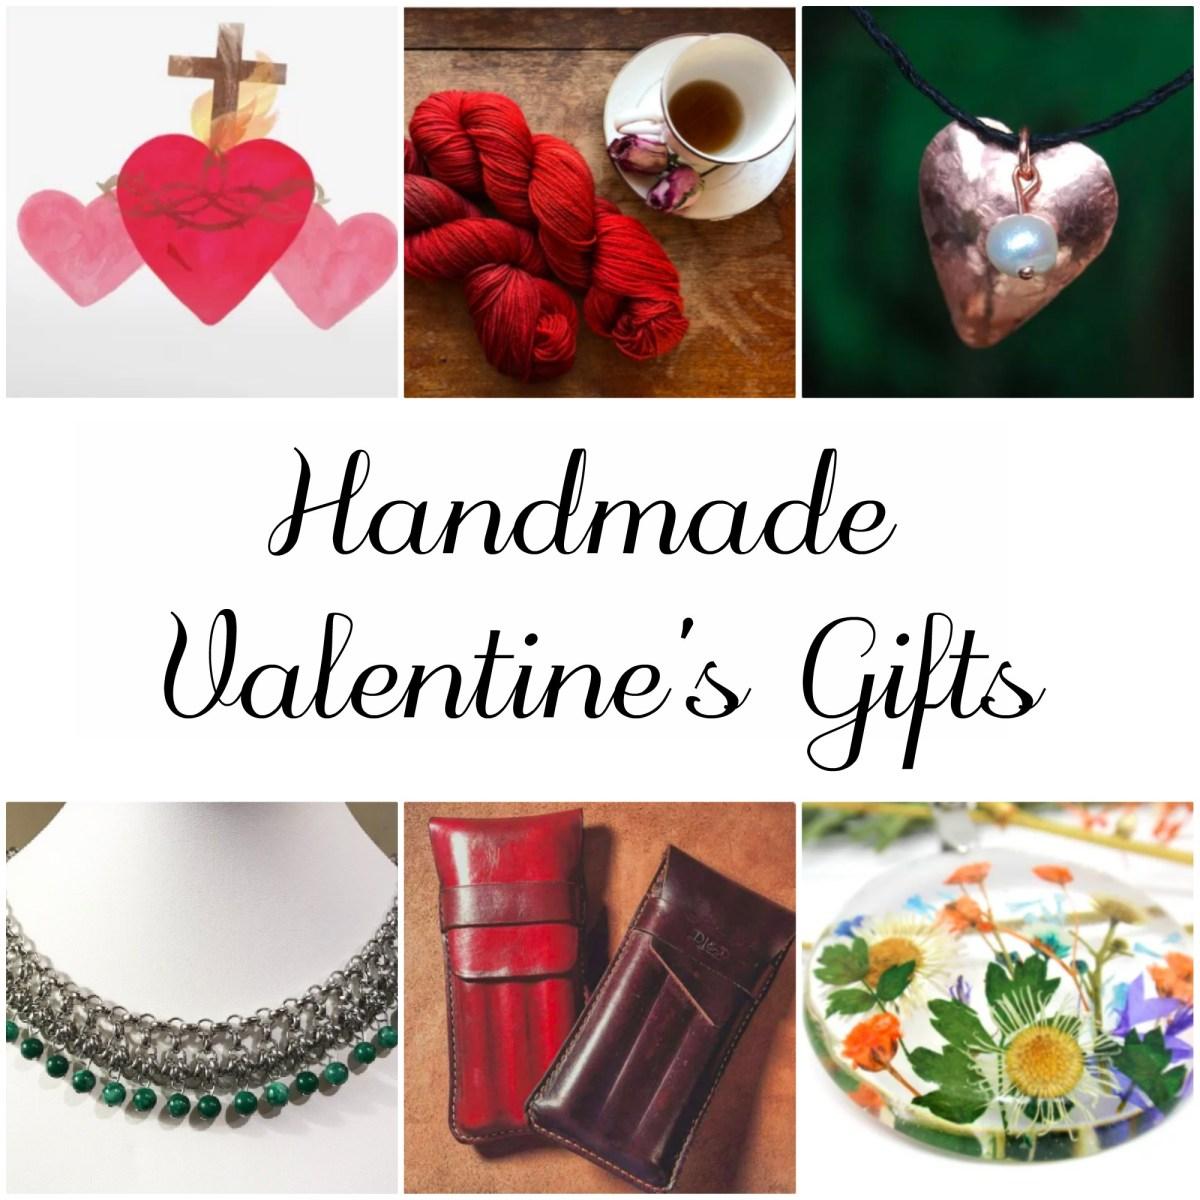 Handmade Gift Guide for Valentine's Day